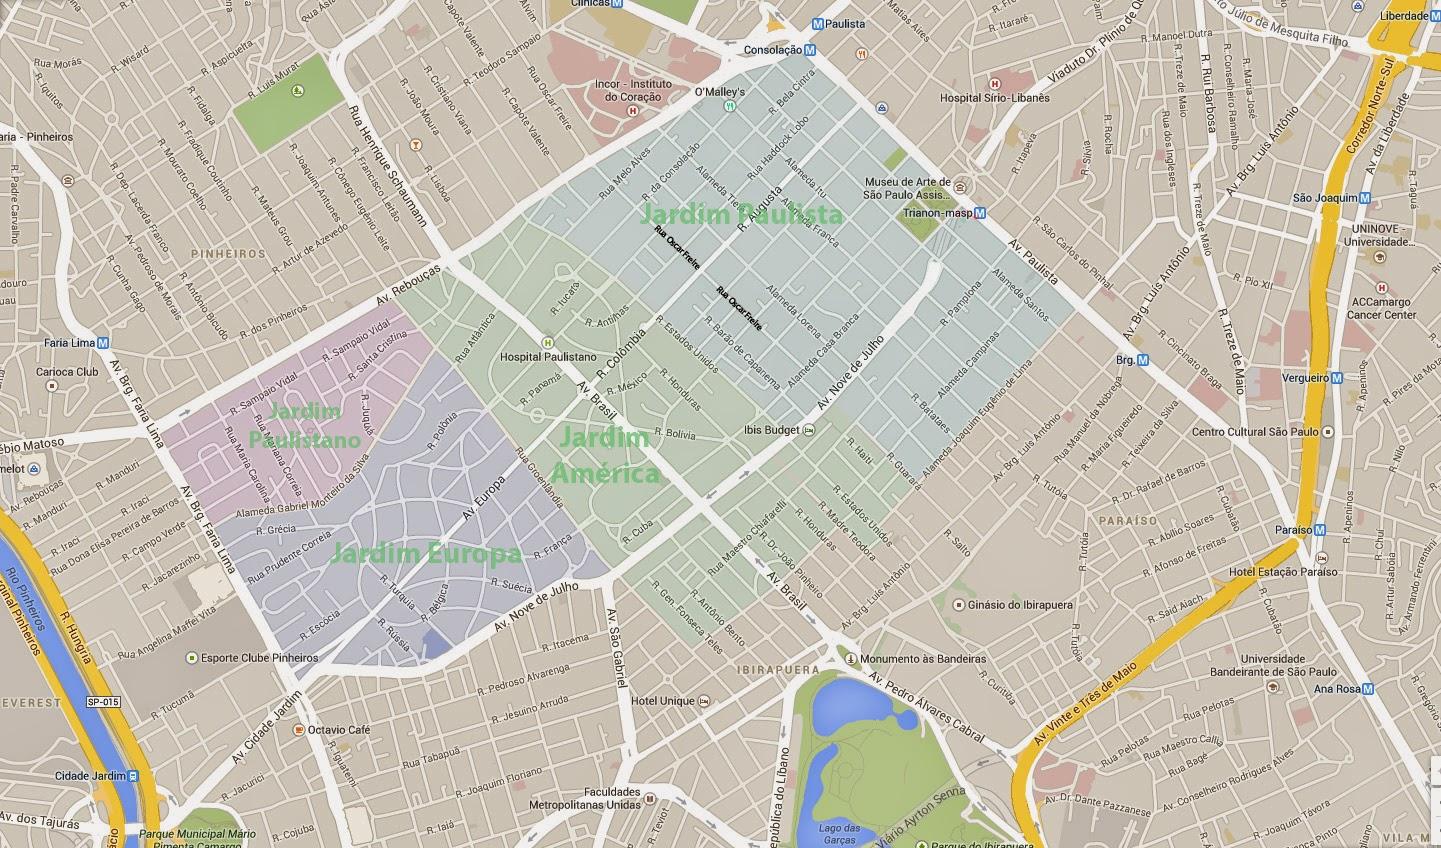 Jardim Paulista, Jardim América, Jardim Europa e Jardim Paulistano